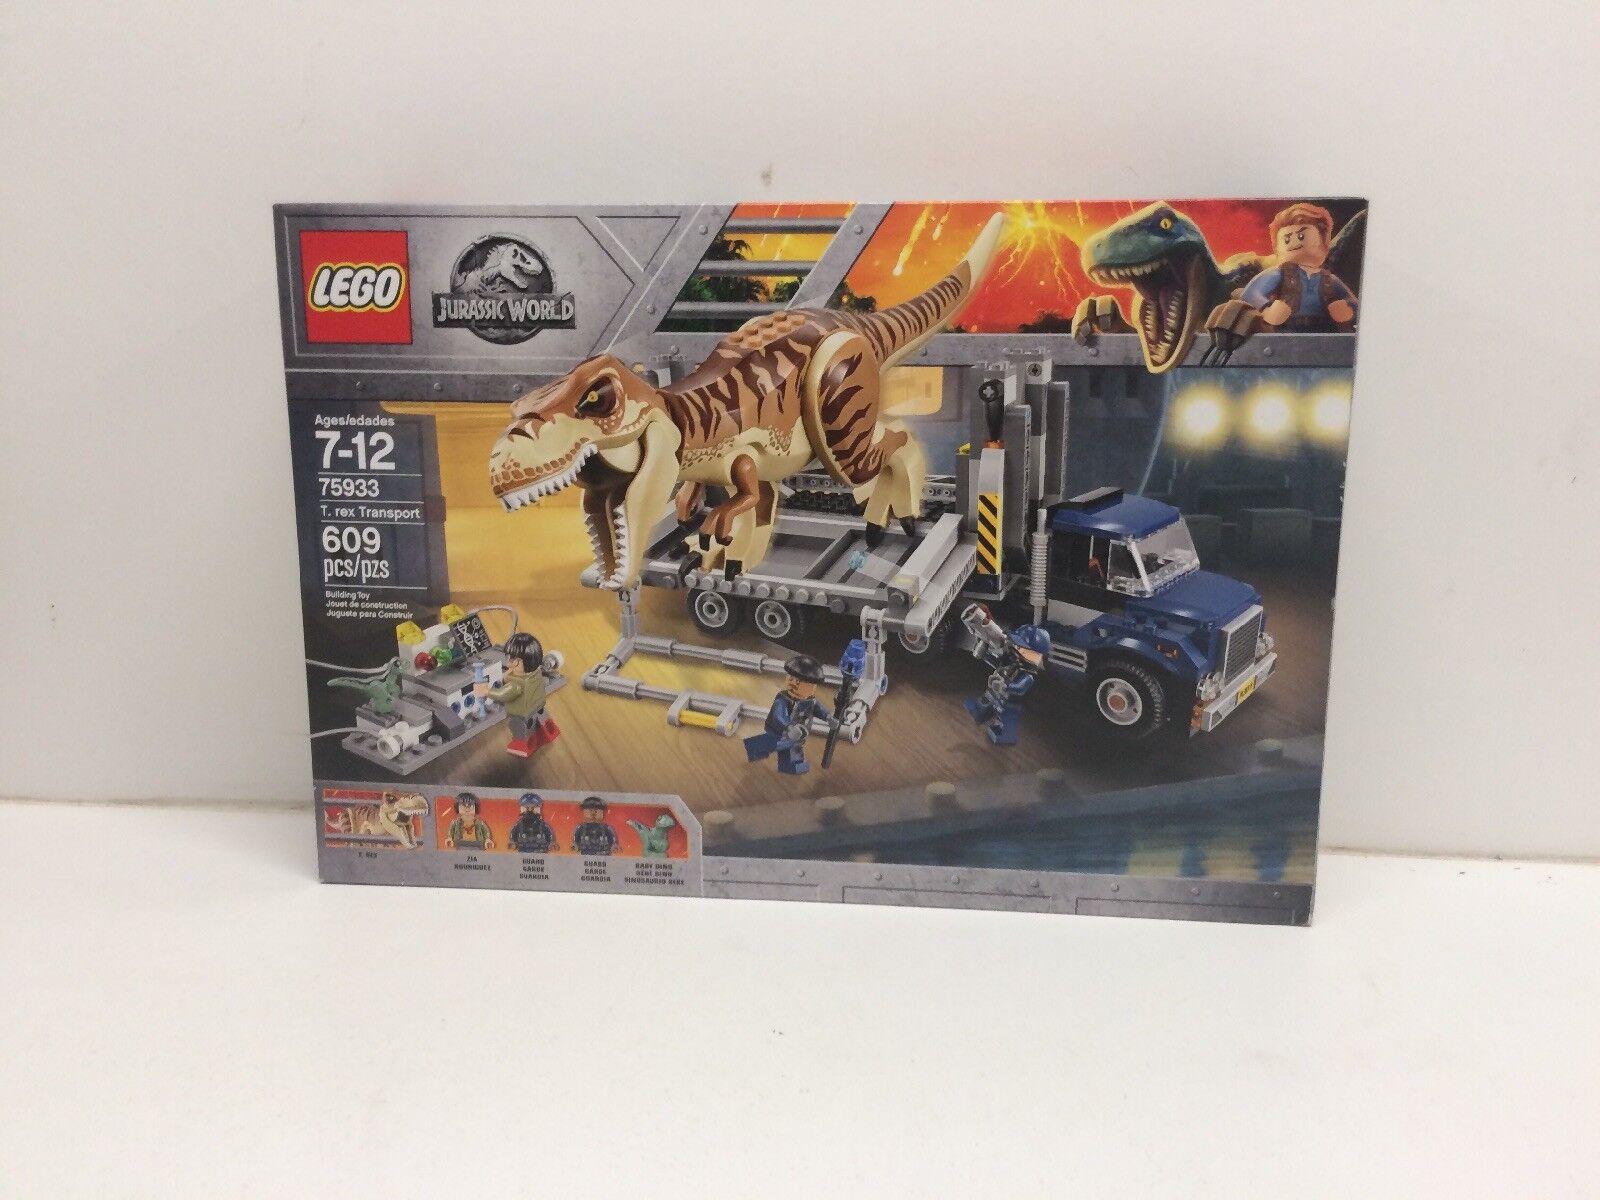 NEW  LEGO Jurassic World 75933 T.rex Transporter NIB Factory Sealed